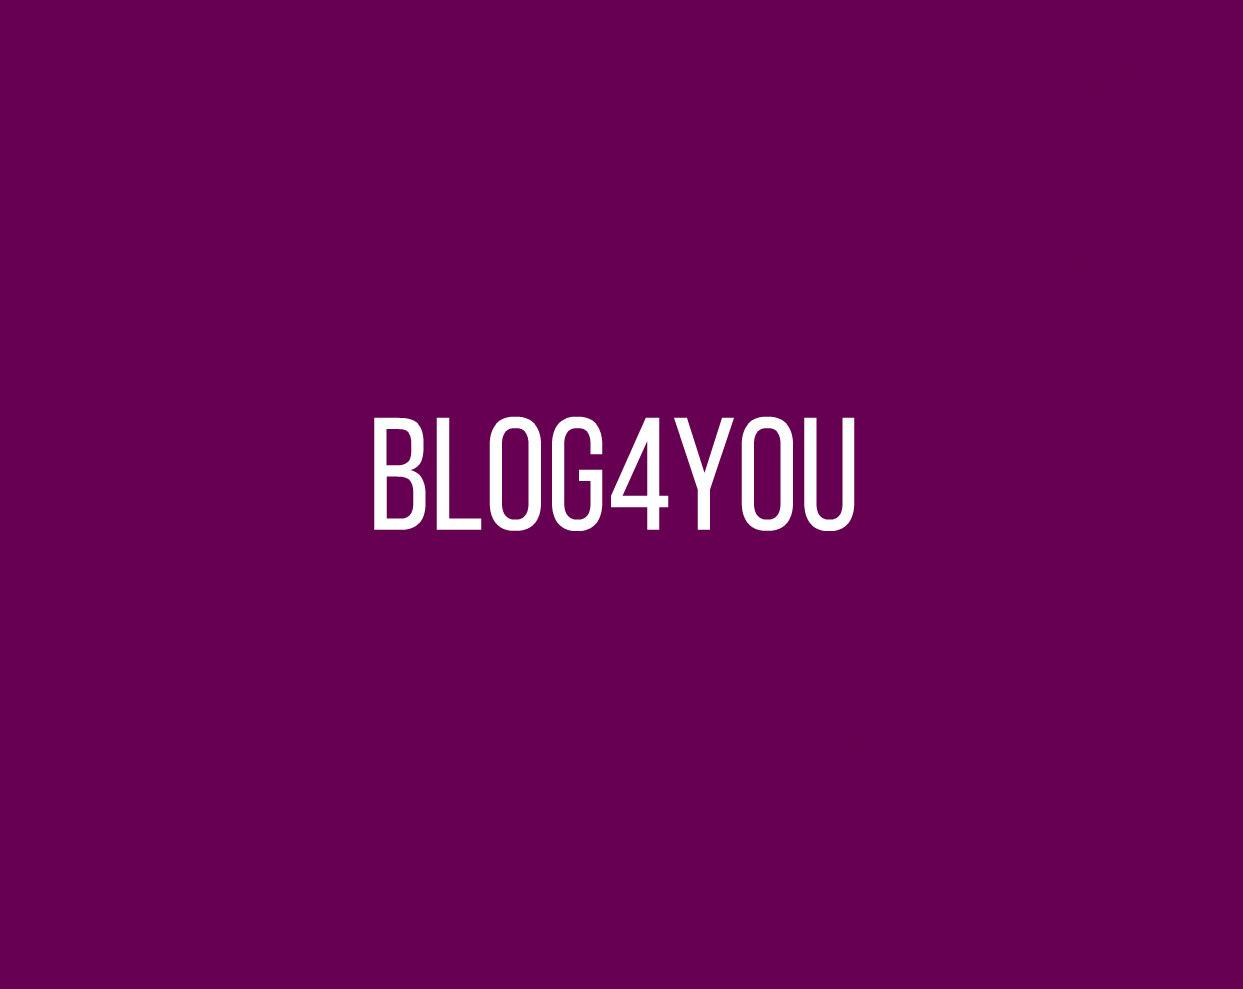 blog4you